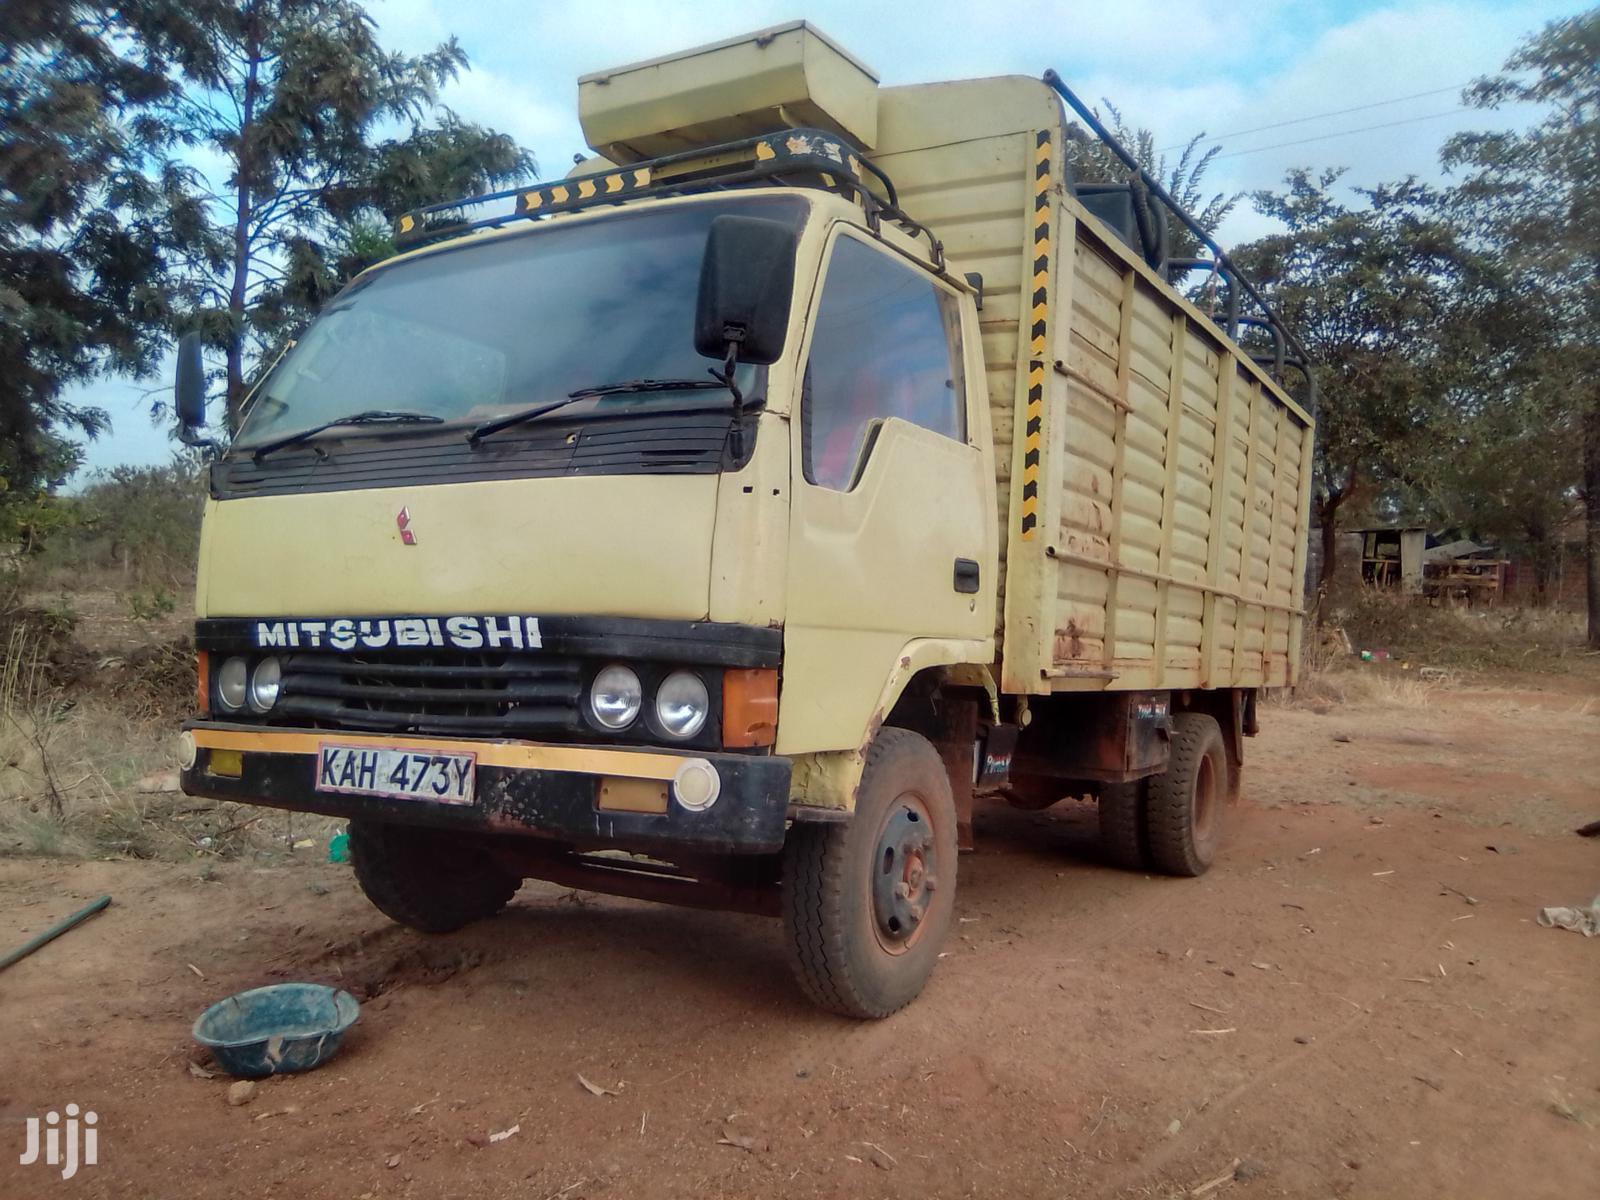 Mitsubishi Canter 4D31 Local 1996 Beige   Trucks & Trailers for sale in Nairobi Central, Nairobi, Kenya